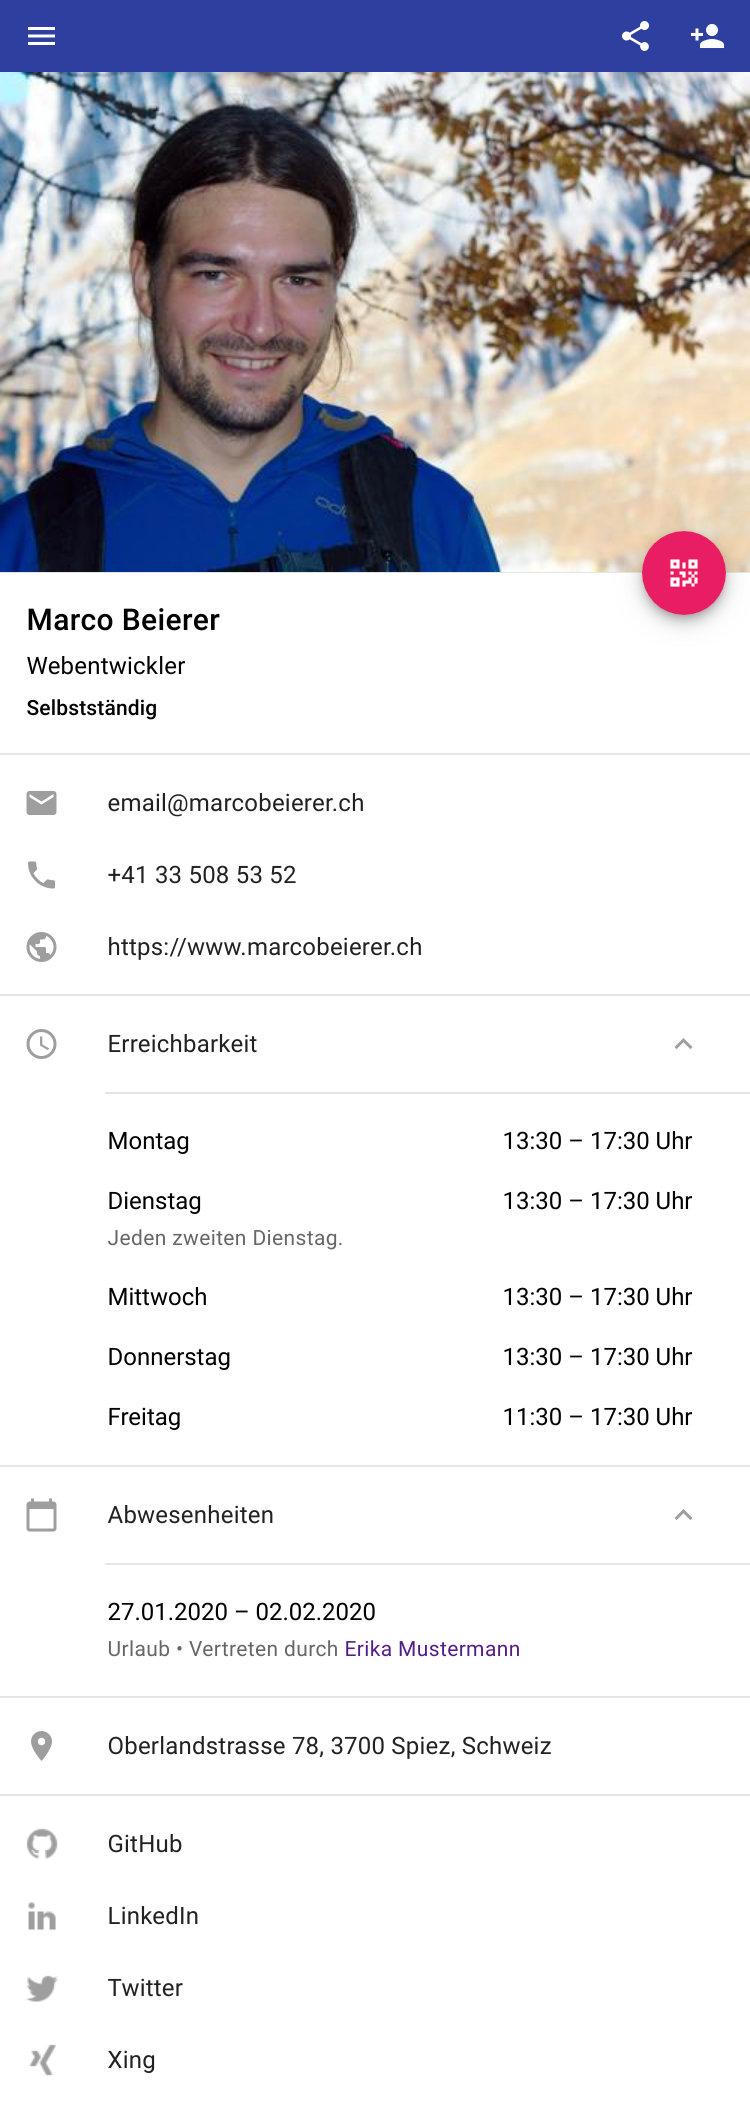 Digitale Visitenkarte Als Website Marco Beierer